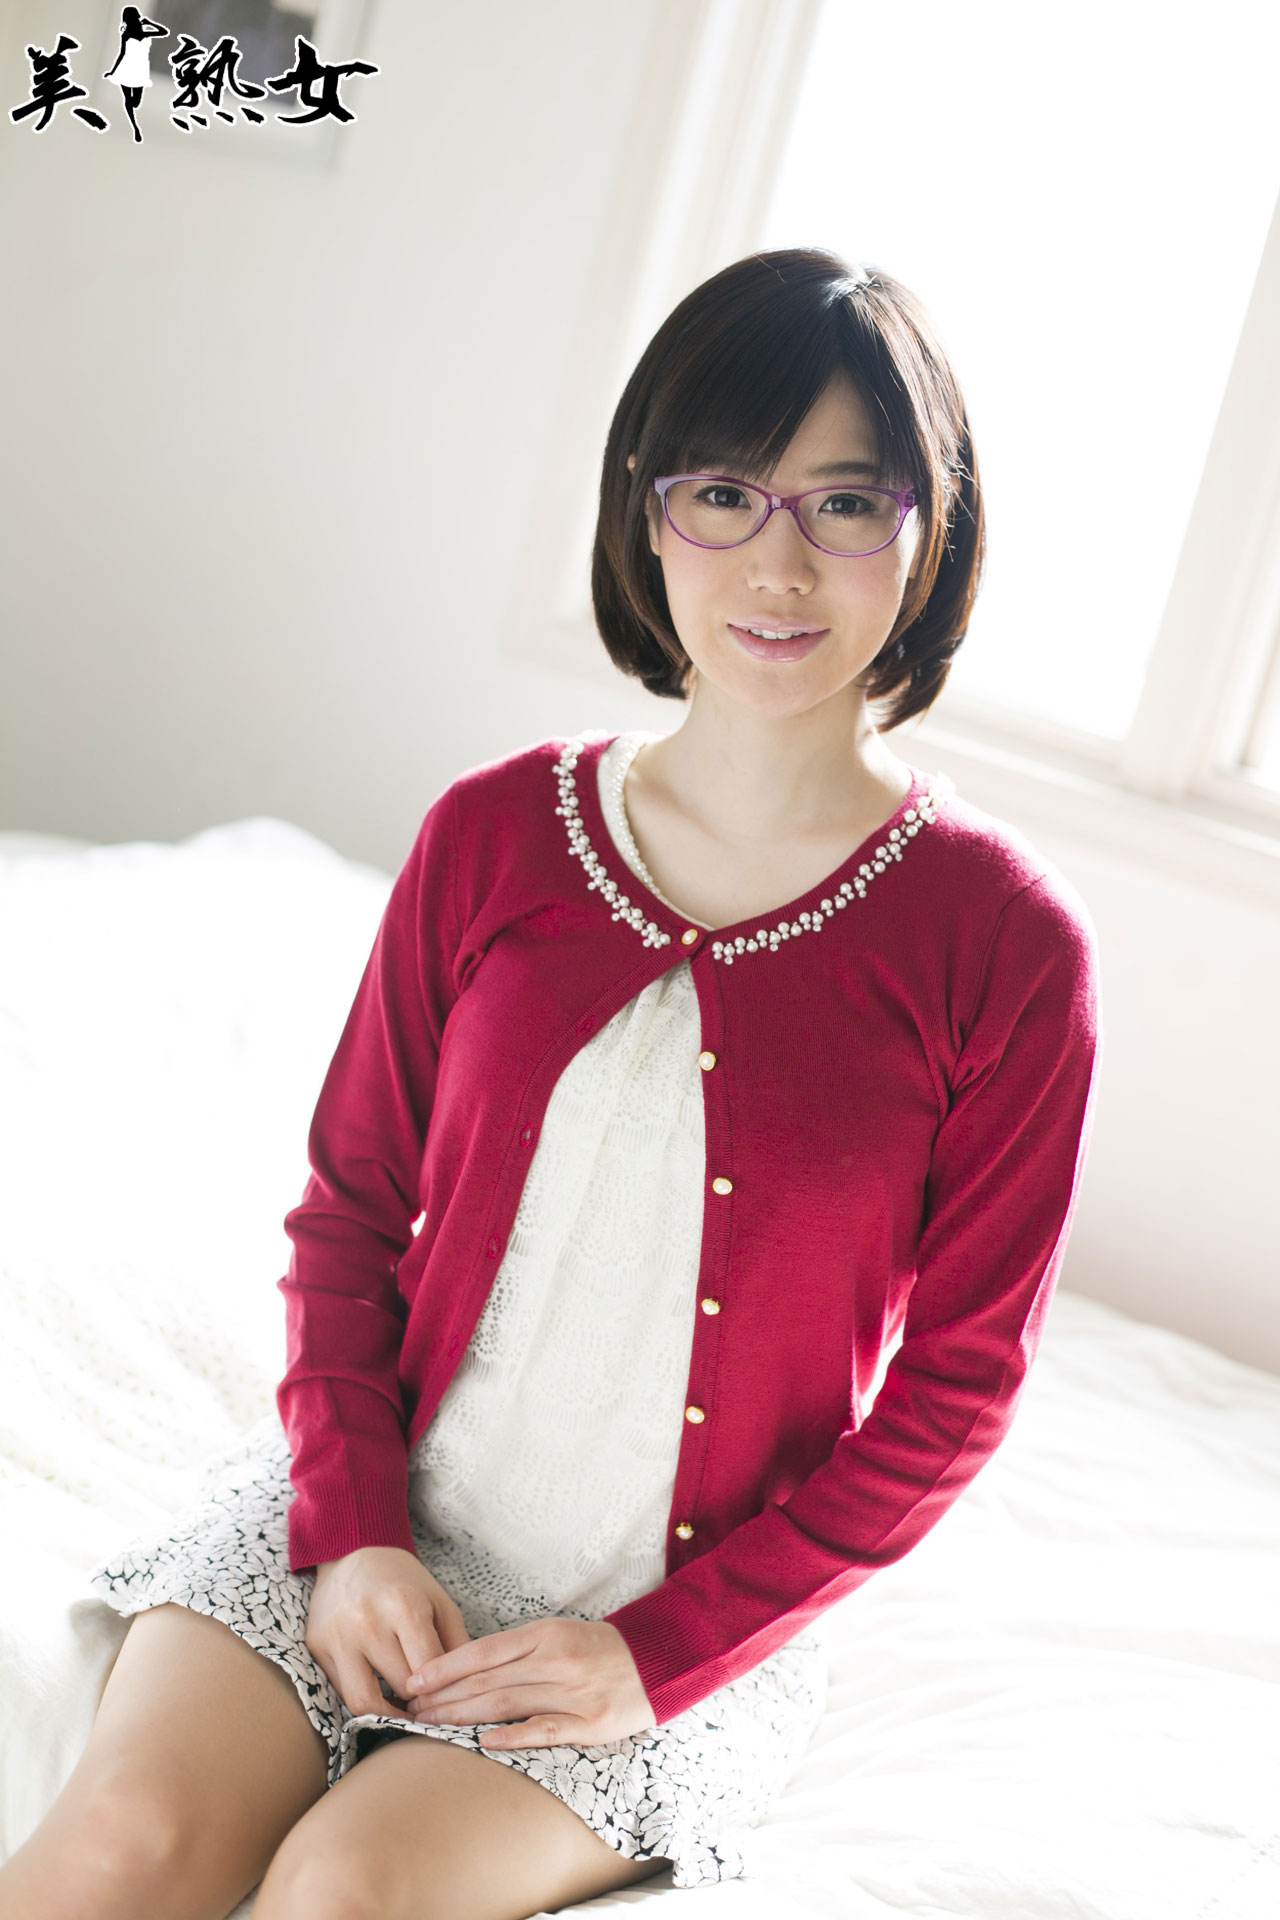 [X-City] JUKUJO 031 ~人気熟女Web寫真集~ Nanako Mori 森ななこ 3 - 貼圖 - 清涼寫真 -